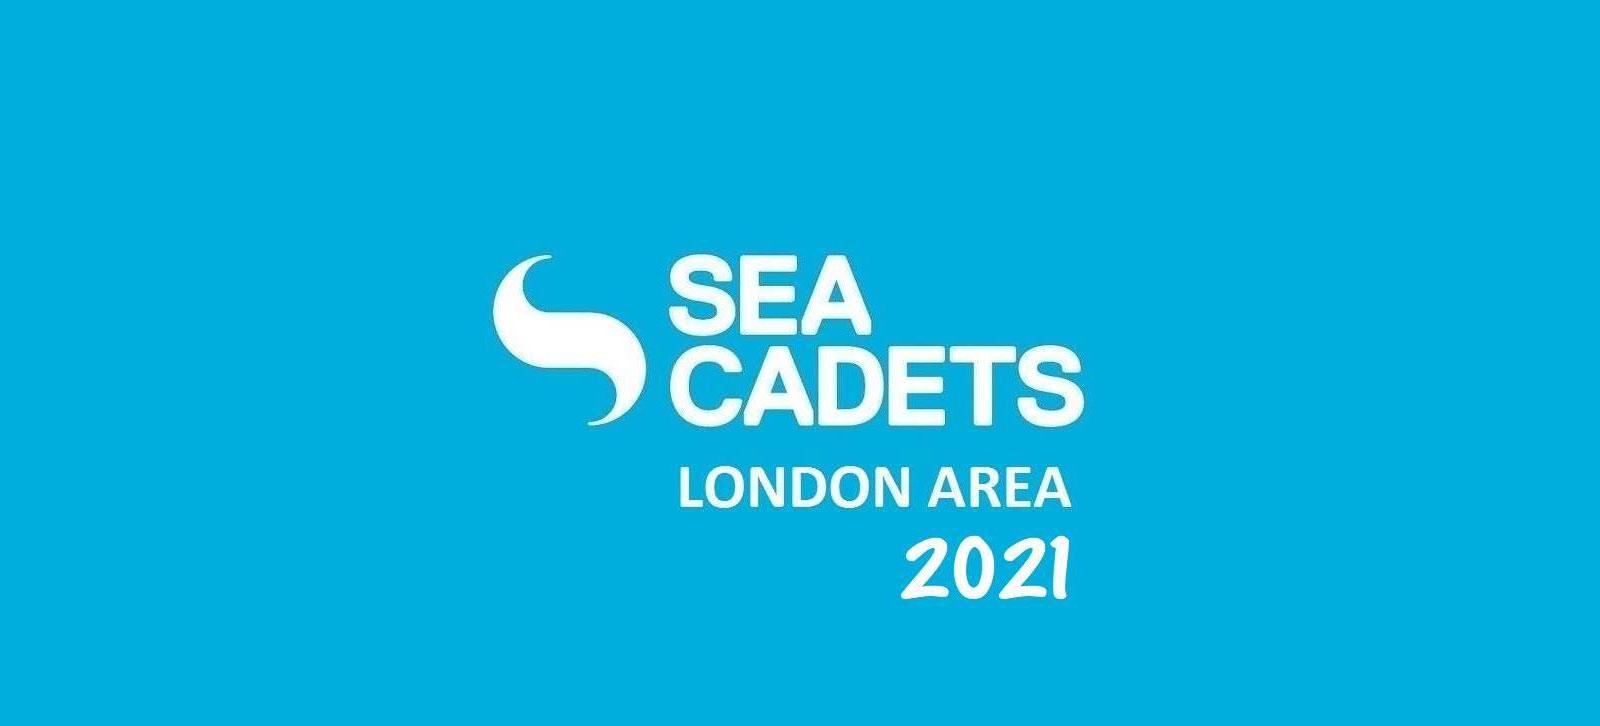 London Area Sea Cadets